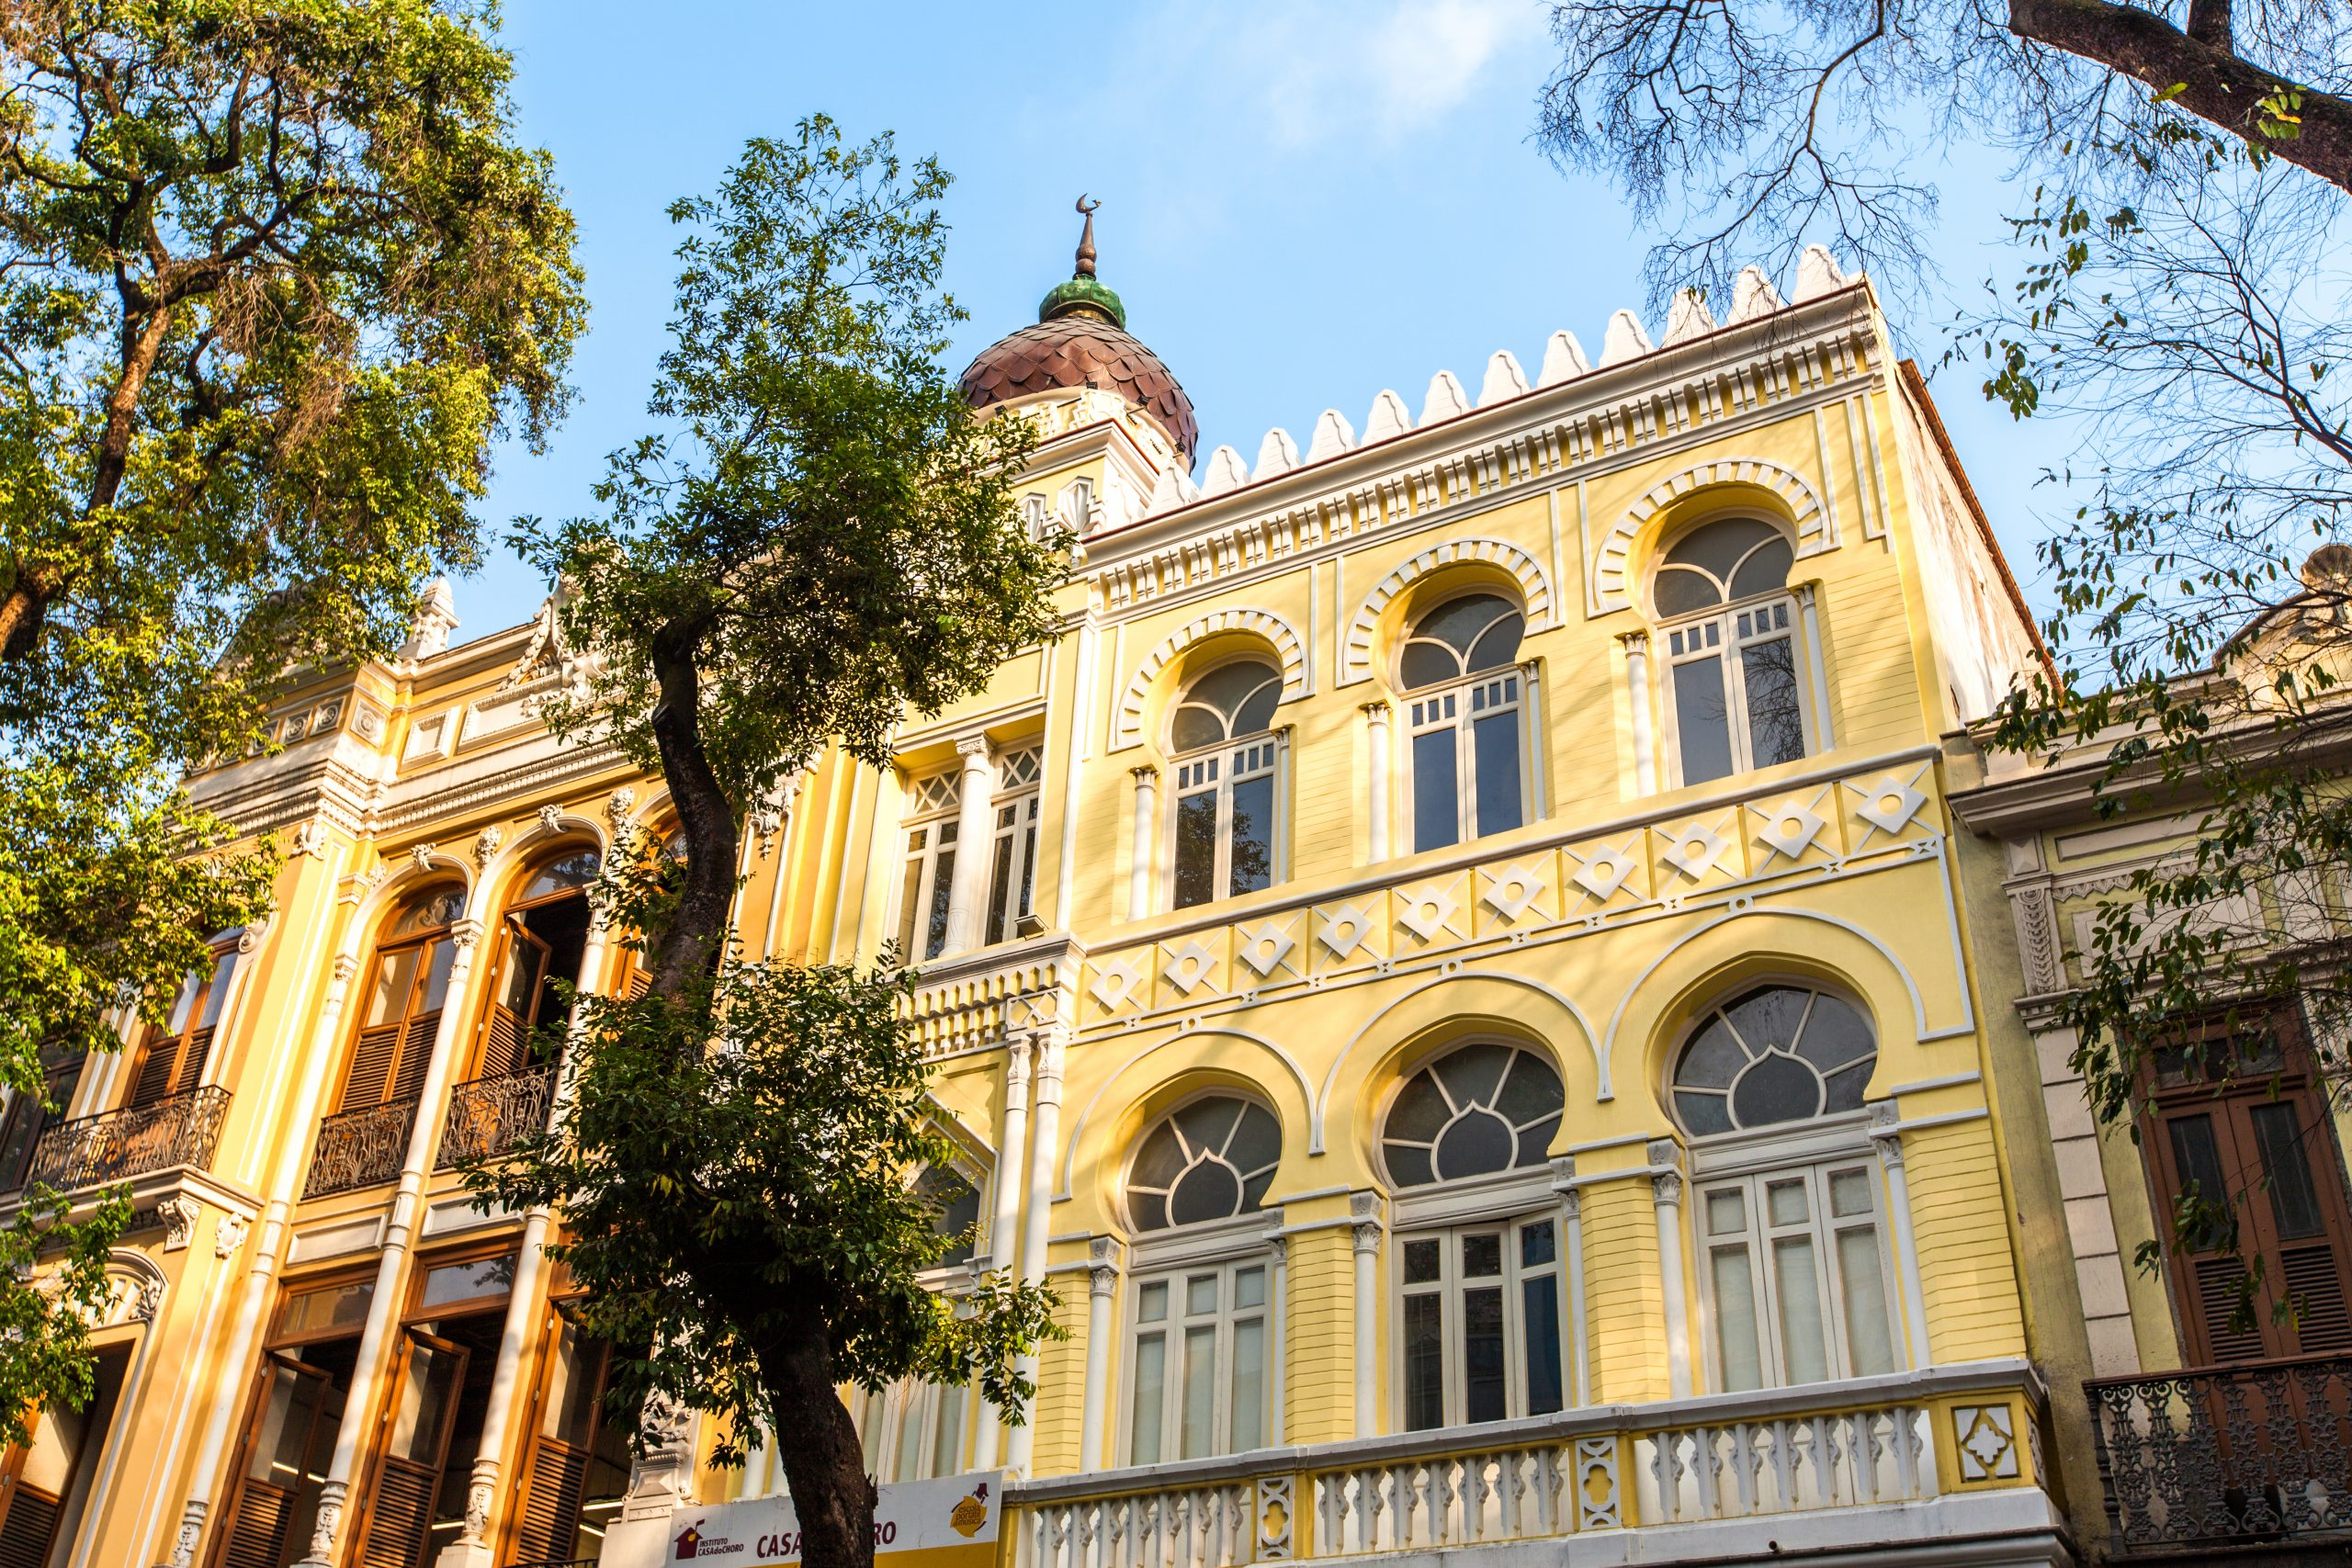 Fachada da Casa do Choro, localizada na Rua da Carioca, com Centro do Rio - Foto: Fabiano Battaglin